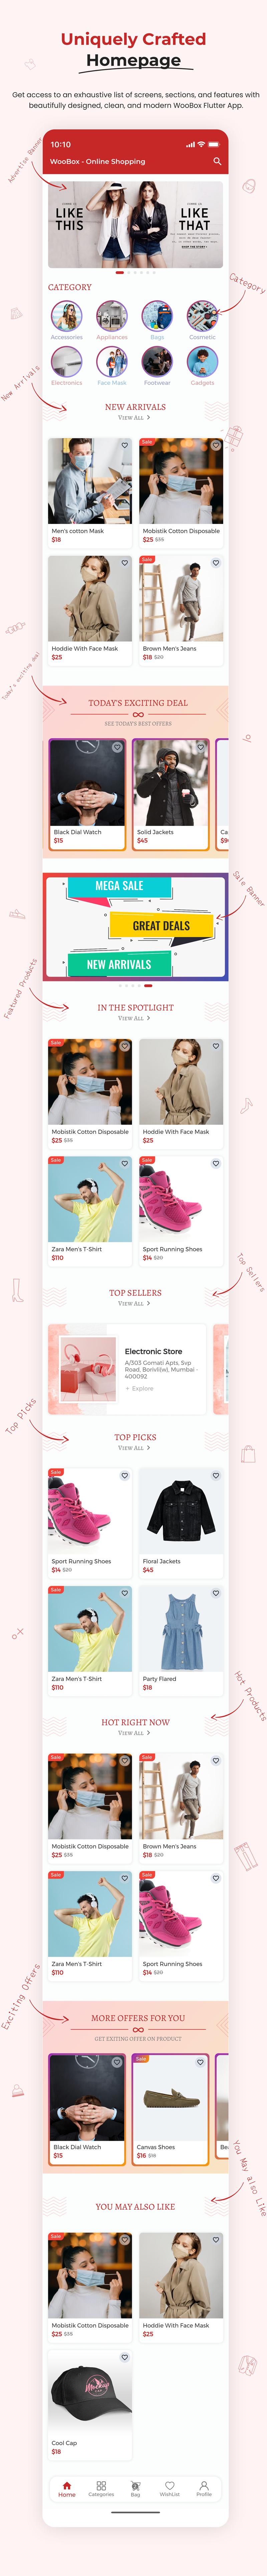 1 woocommerce flutter 2.0 e-commerce full mobile app All New WooBox 2.0 1 homepages